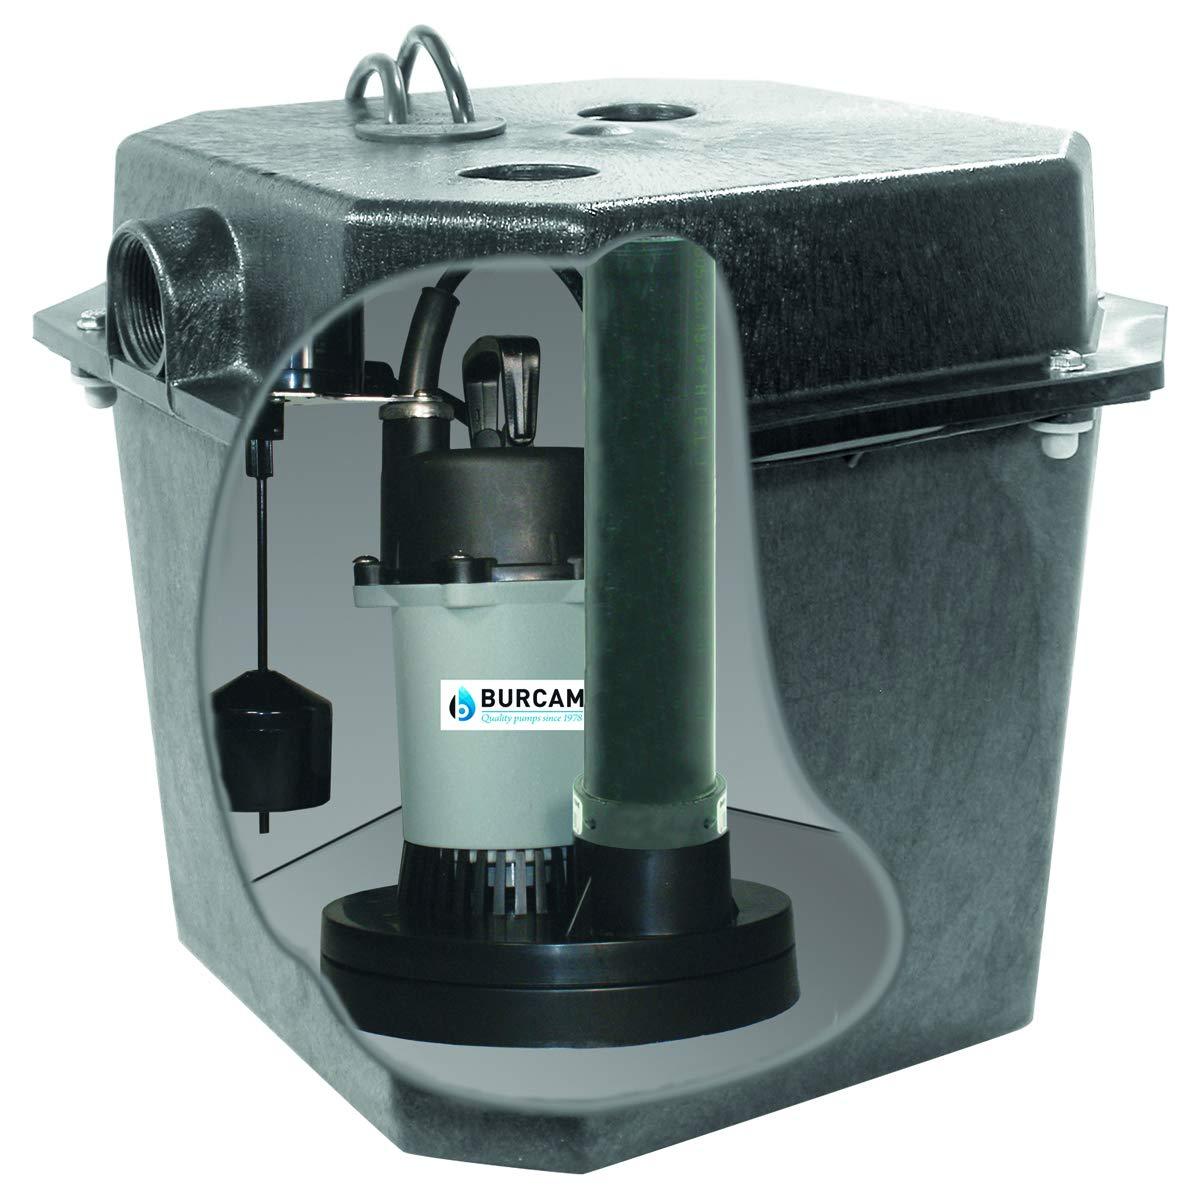 BURCAM 300319B 1/4 HP Automatic Under Sink Pump System